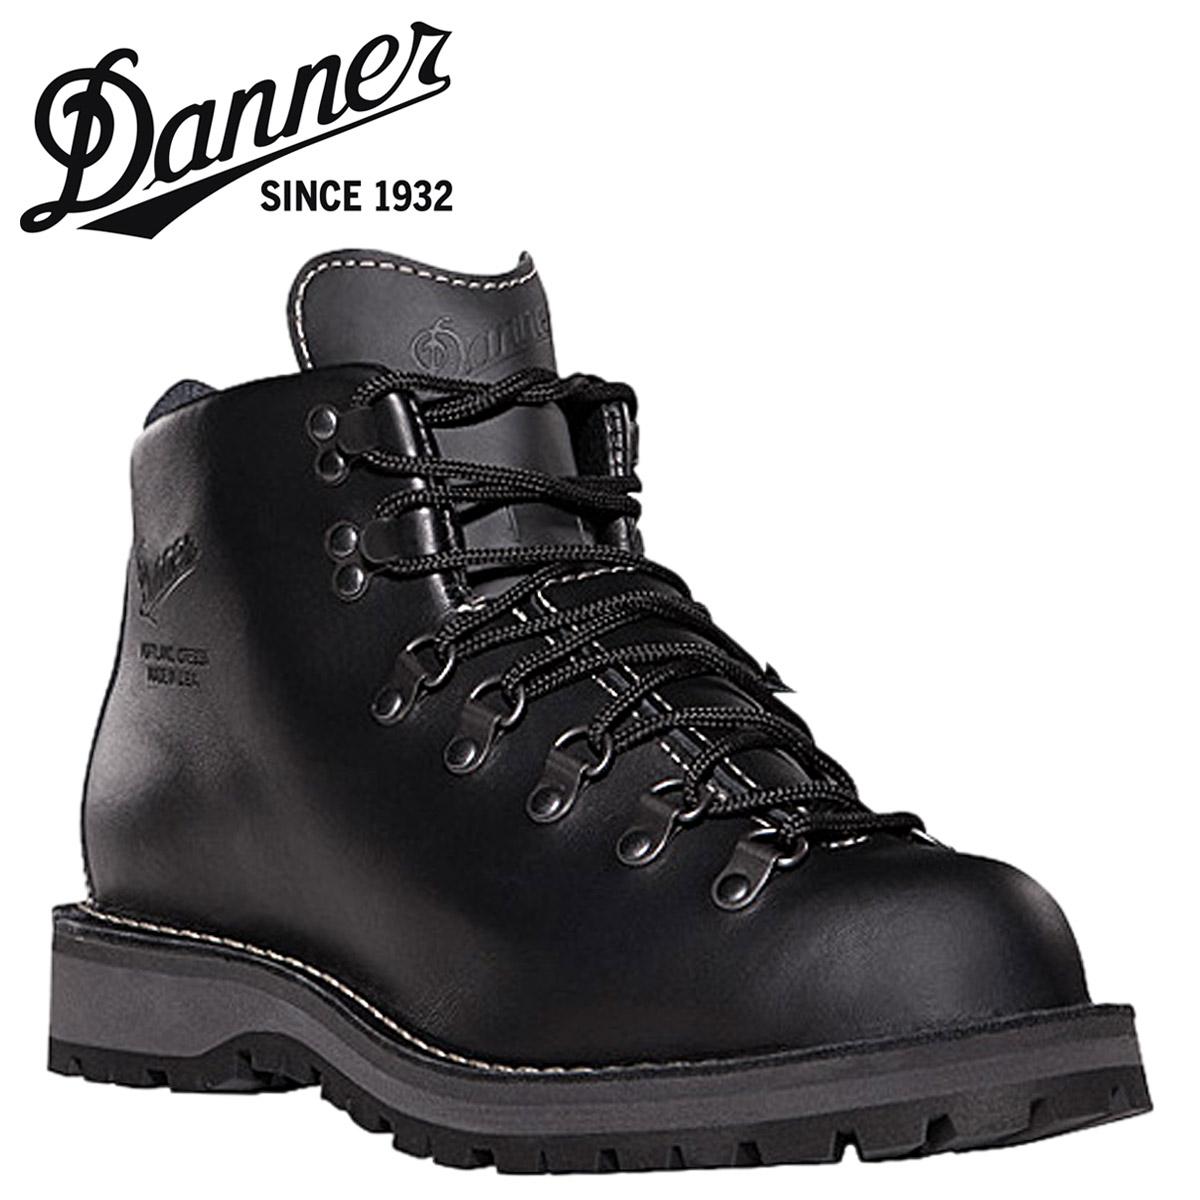 Danner ダナー マウンテンライト2 30860 ブラック Mountain Light II Dワイズ EEワイズ レザー GORE-TEX Made in USA メンズ [3/3 再入荷]